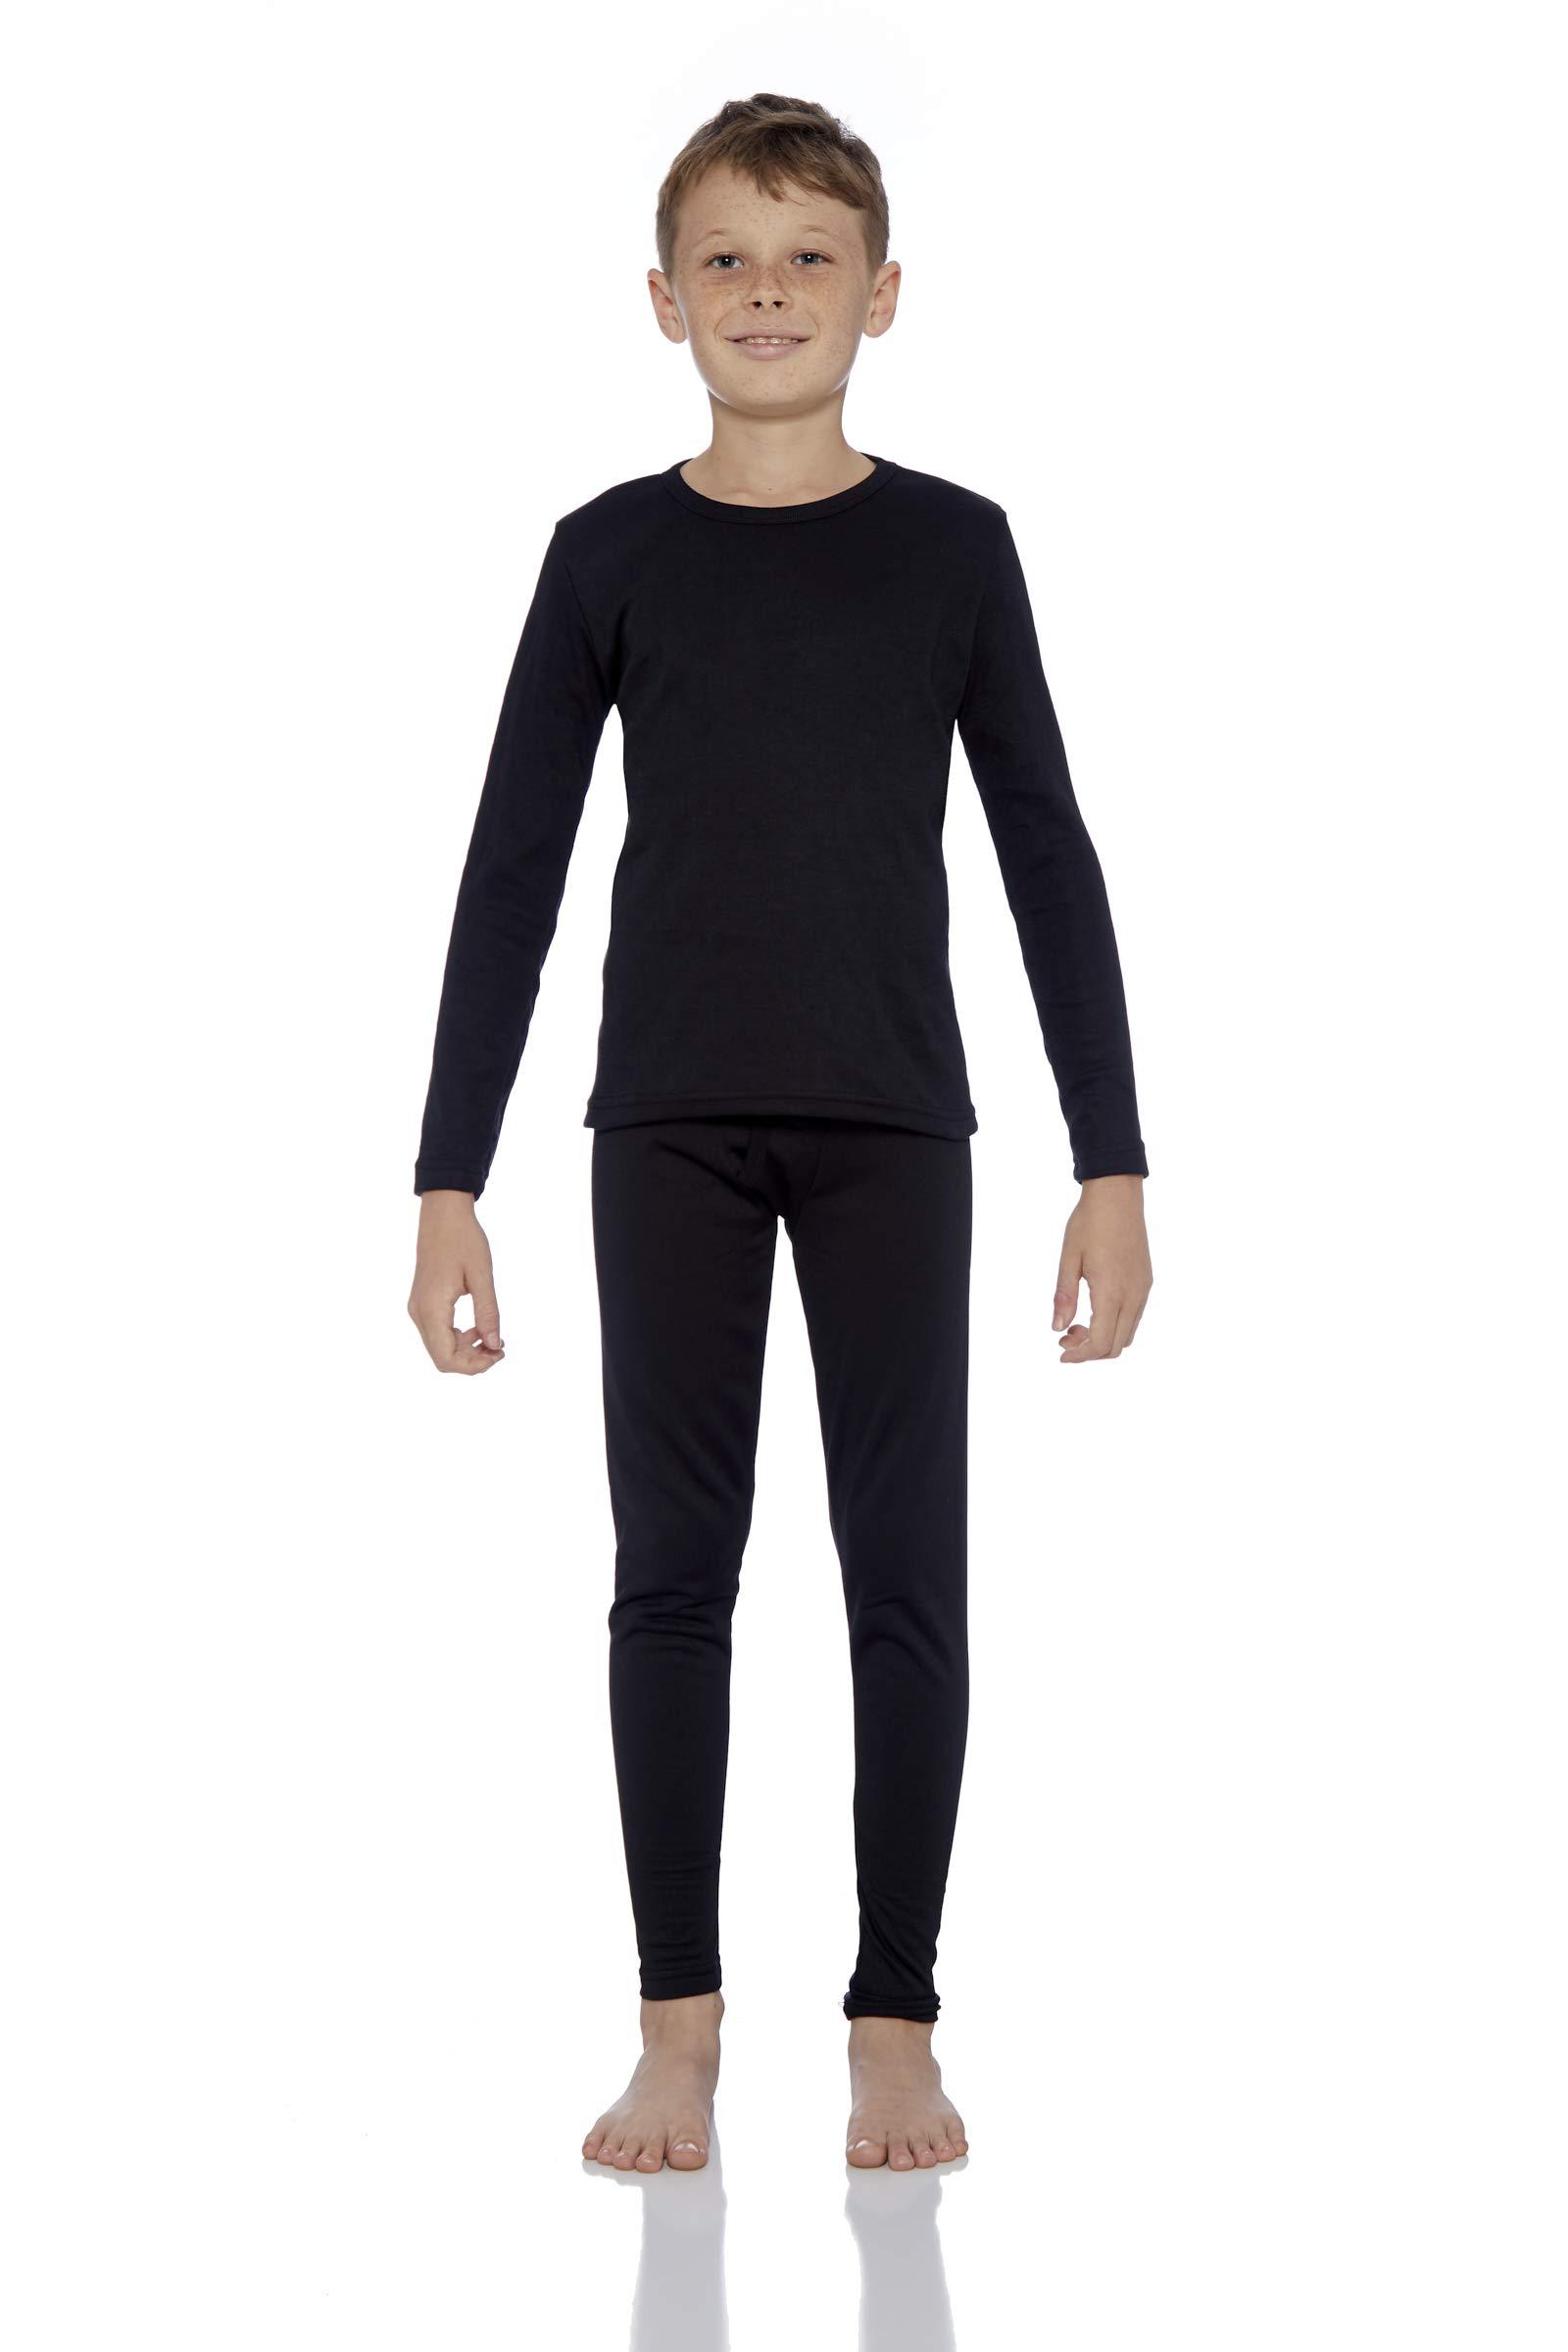 Rocky Boy's Fleece Lined Thermal Underwear 2PC Set Long John Top and Bottom (XS, Black)